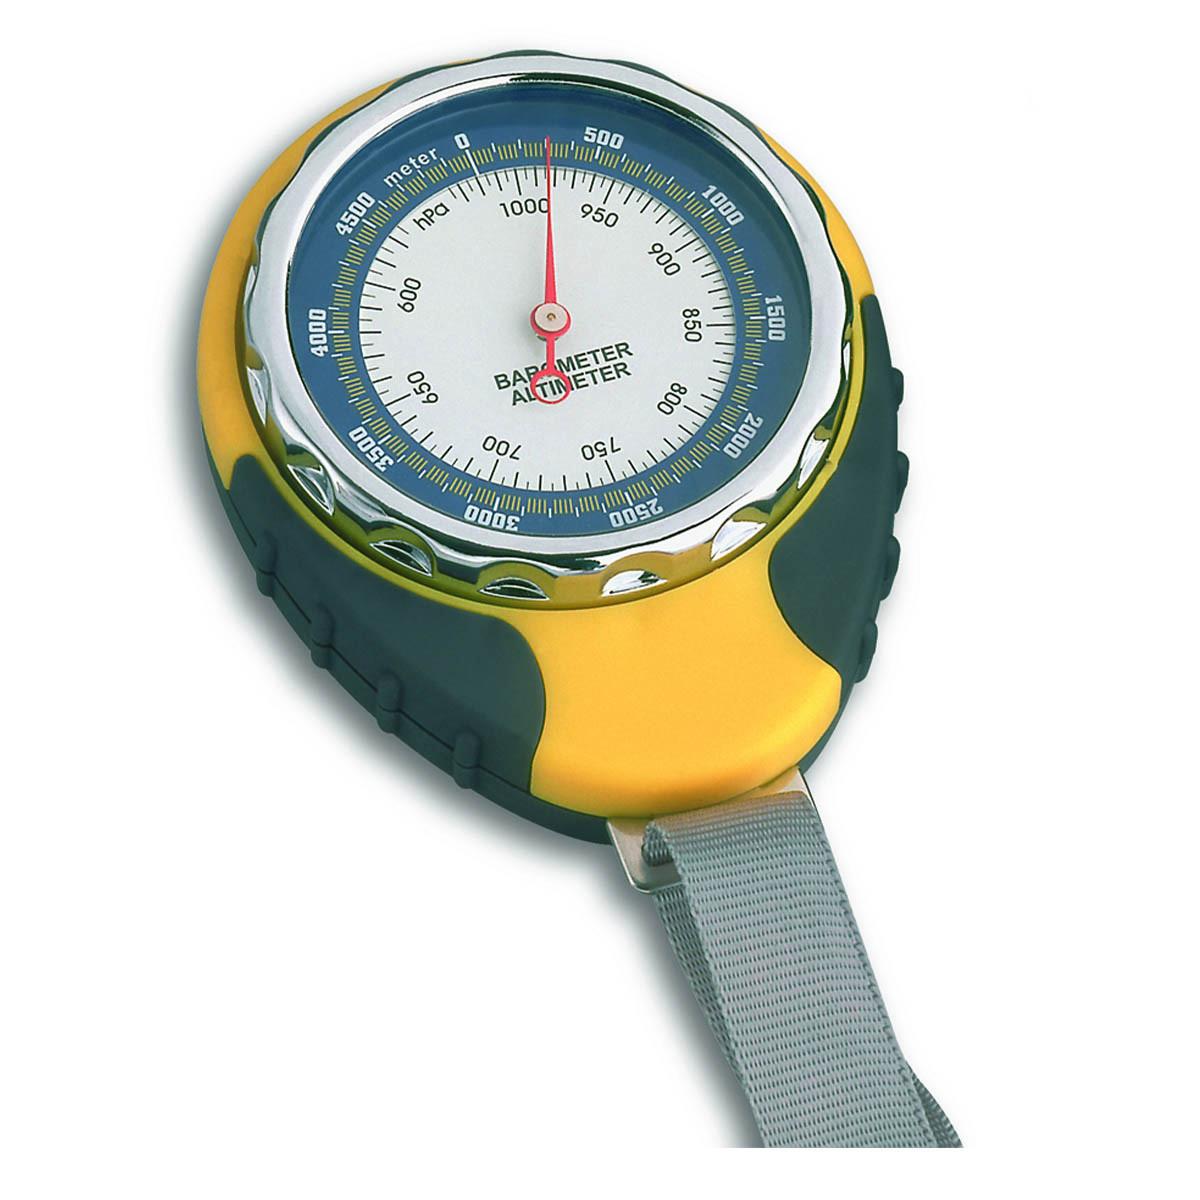 42-4000-höhenmesser-hitrax-globe-1200x1200px.jpg